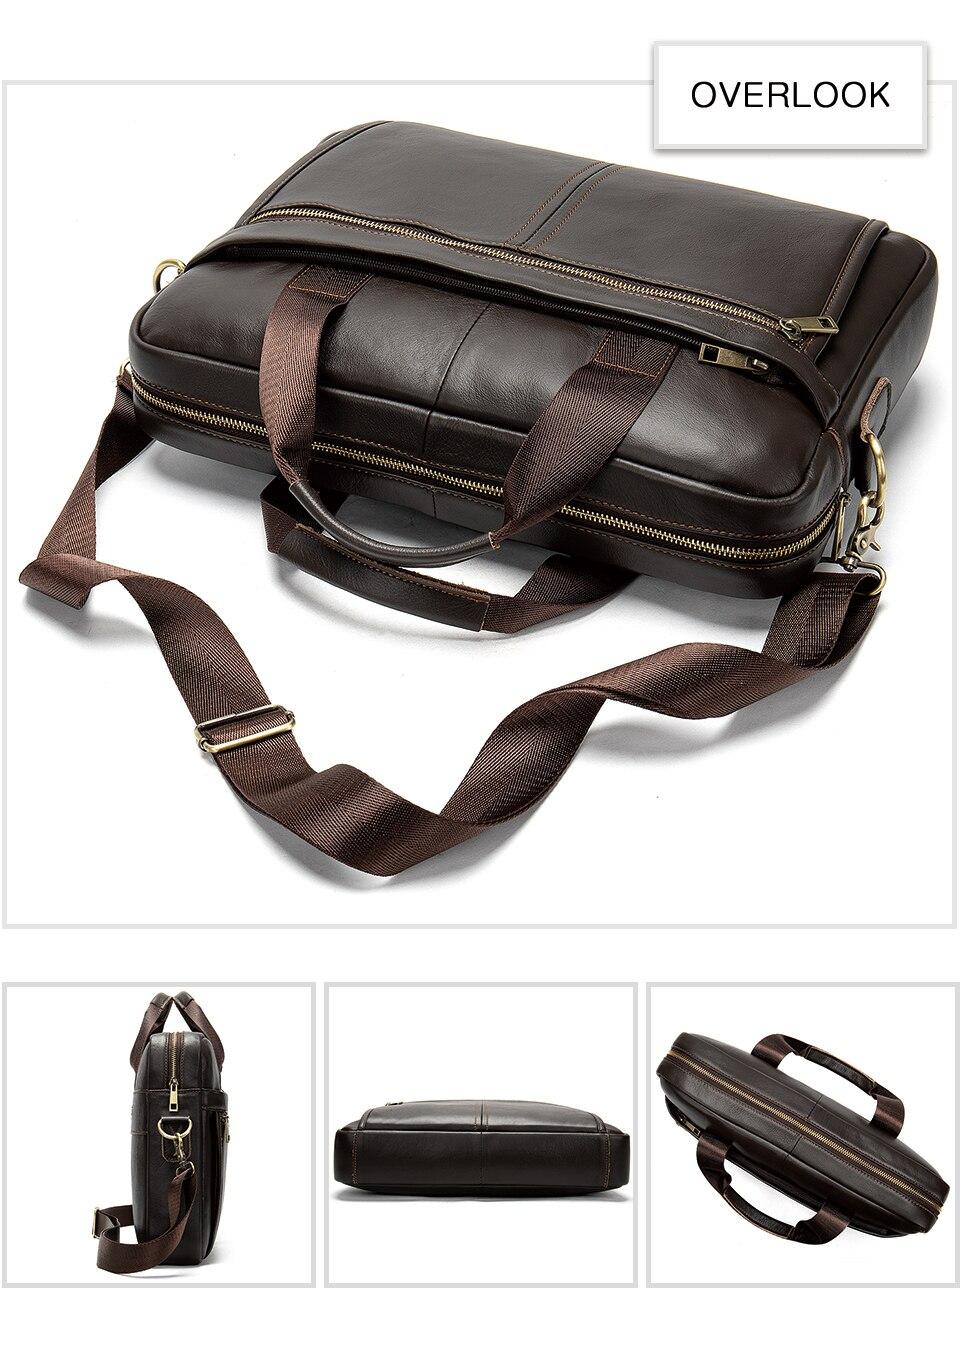 HTB146.wUgHqK1RjSZJnq6zNLpXal MVA men's briefcase/genuine Leather messenger bag men leather/business laptop office bags for men briefcases men's bags 8572